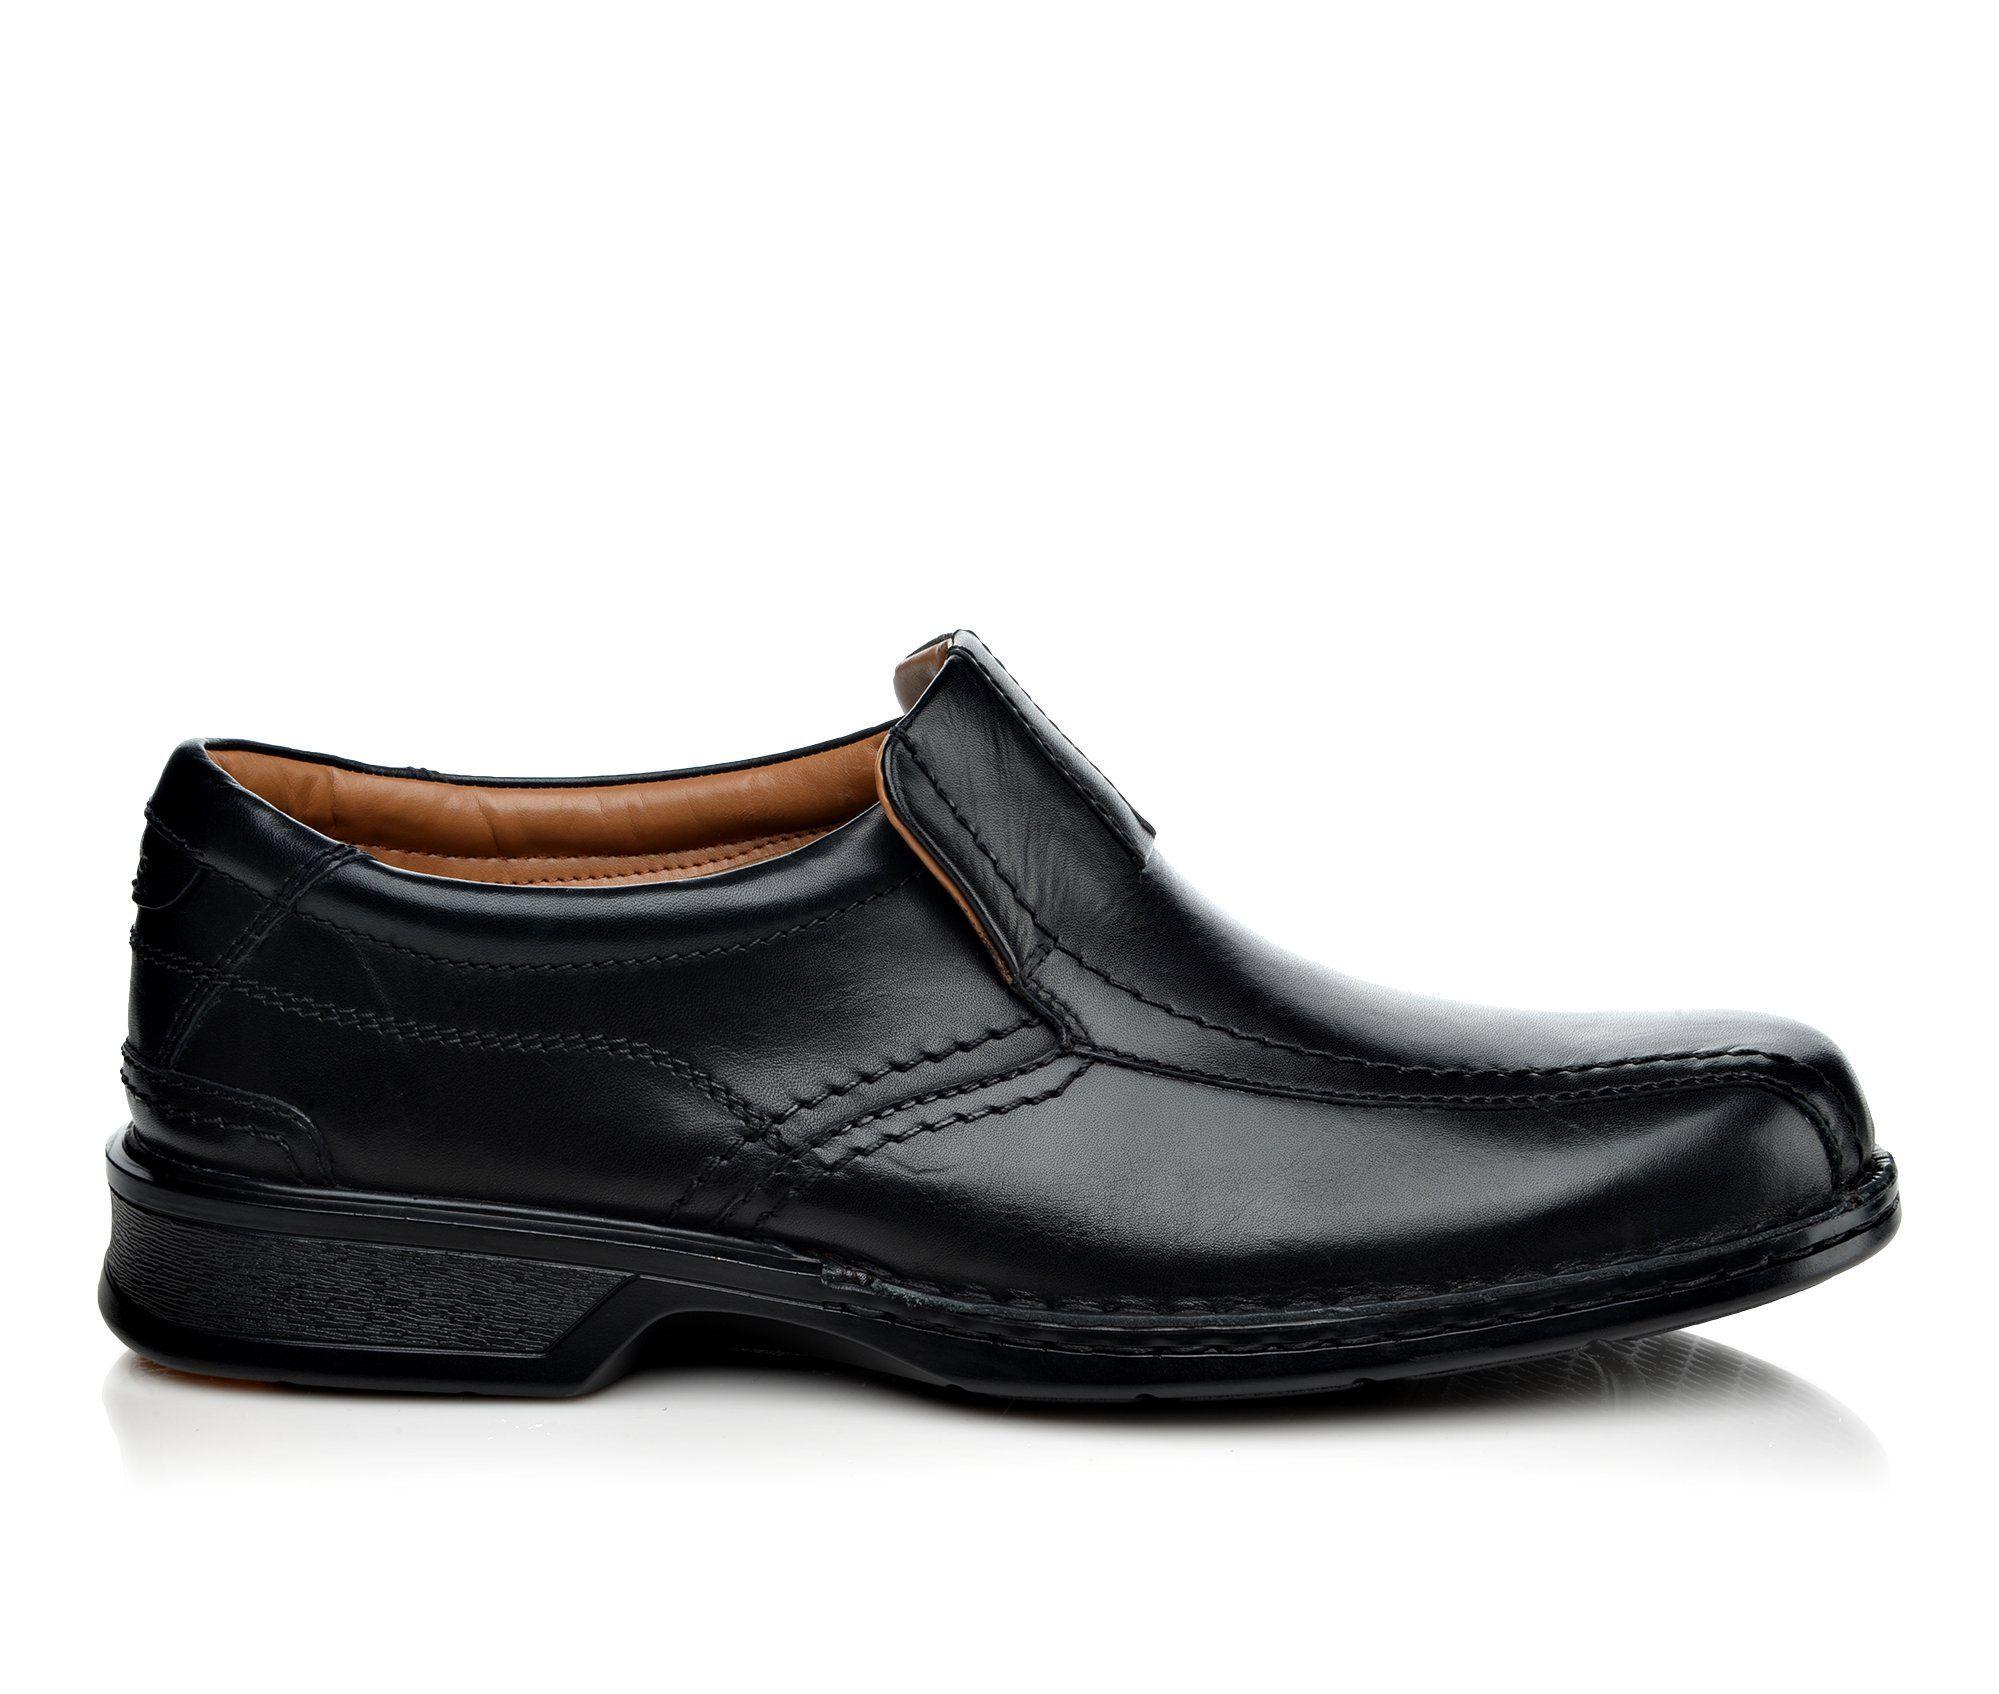 Men's Clarks Escalade Step Slip-On Shoes Black